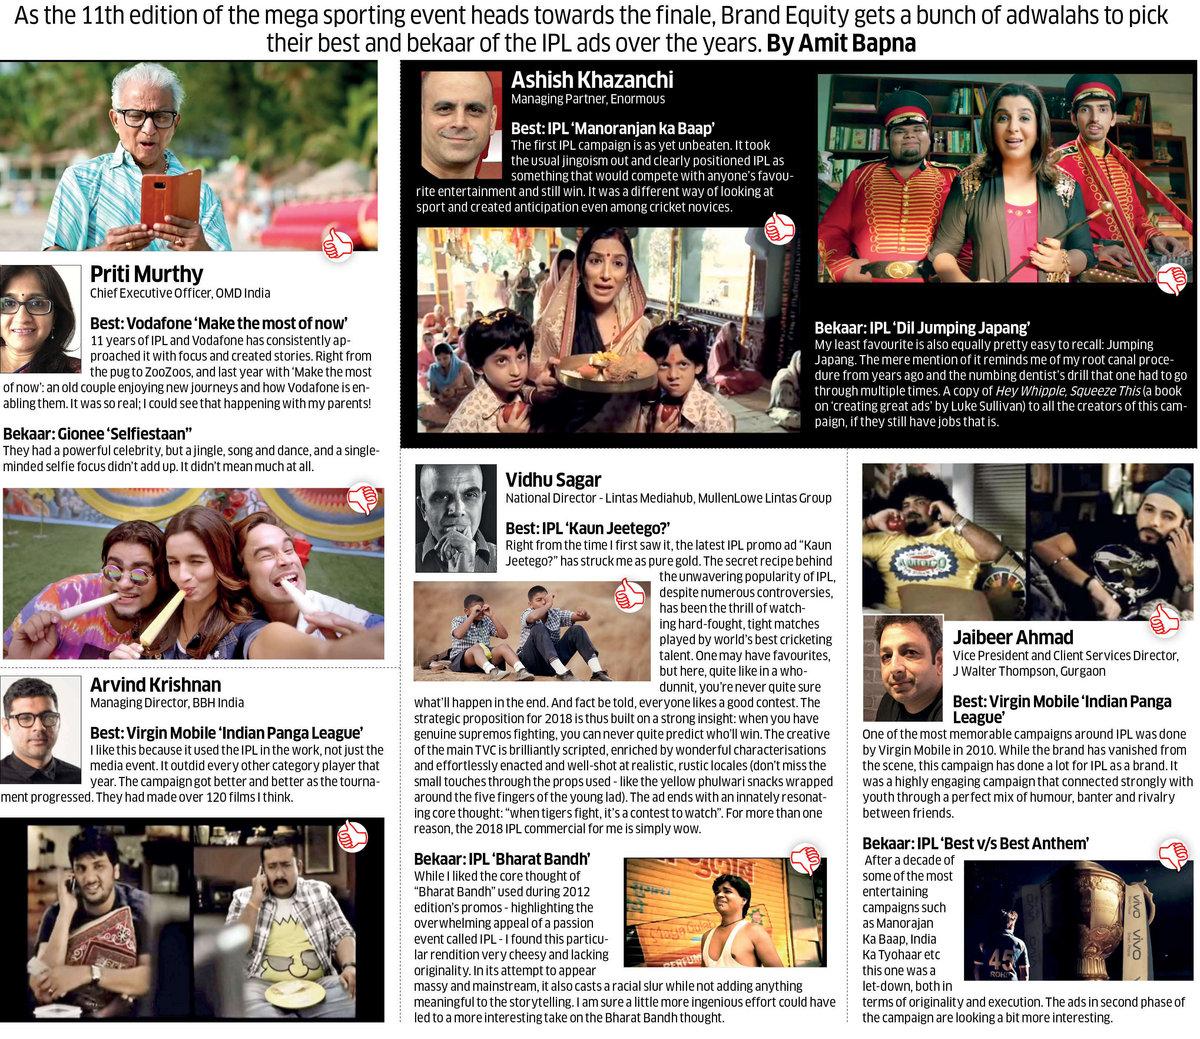 Muqaddar ka badshah full movie in hindi download hd 1080p azgesphyzel muqaddar ka badshah full movie in hindi download hd 1080p ccuart Gallery